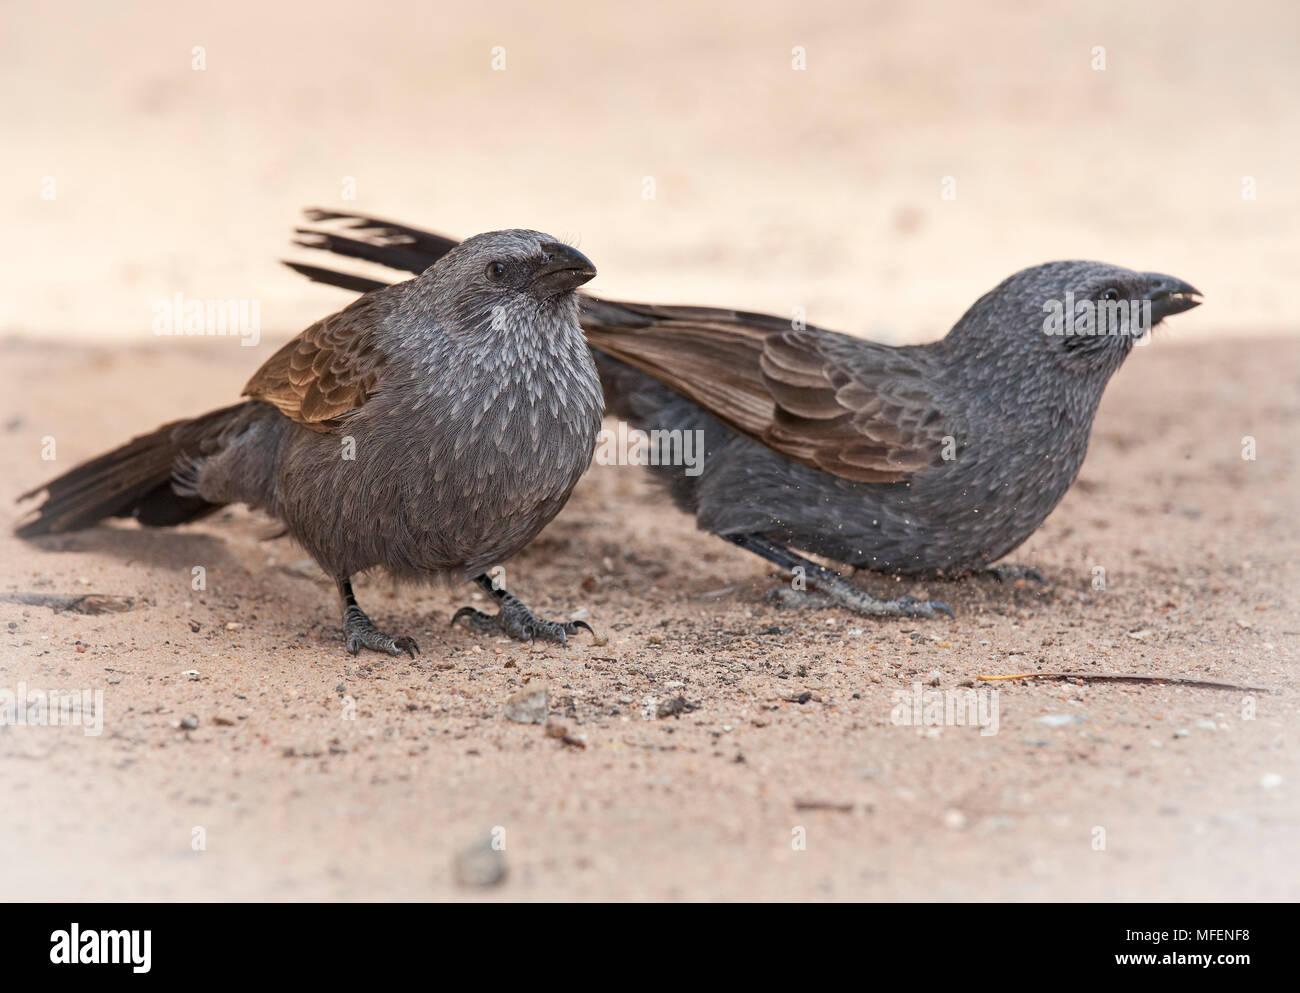 Apostlebird (Struthidea cinerea), Fam. Corcoracidae, Highly social birds, Kinchega National Park, New South Wales, Australia - Stock Image